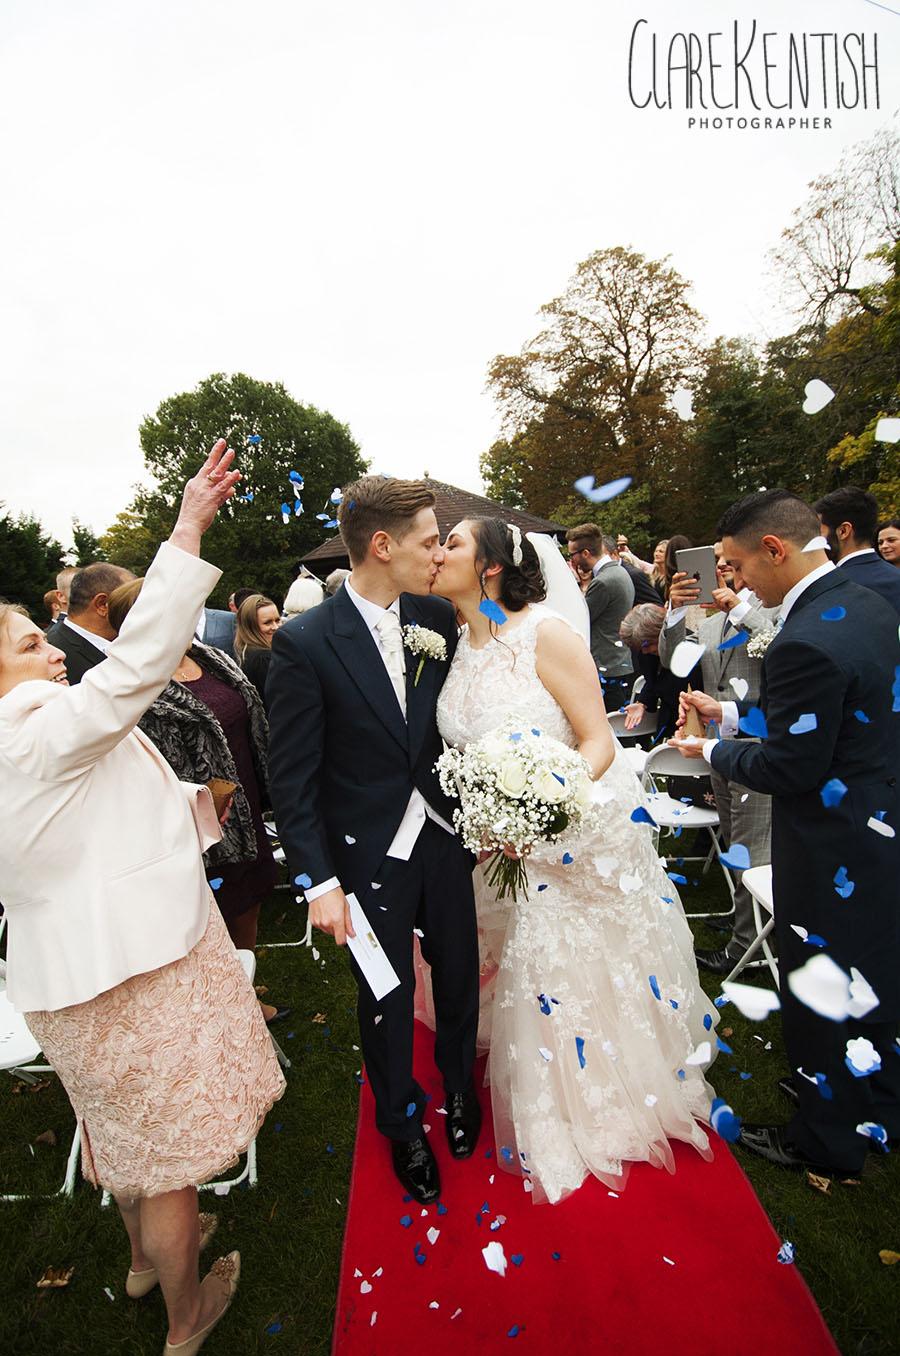 Essex_Wedding_Photographer_Rayleigh_Clare_Kentish_1041